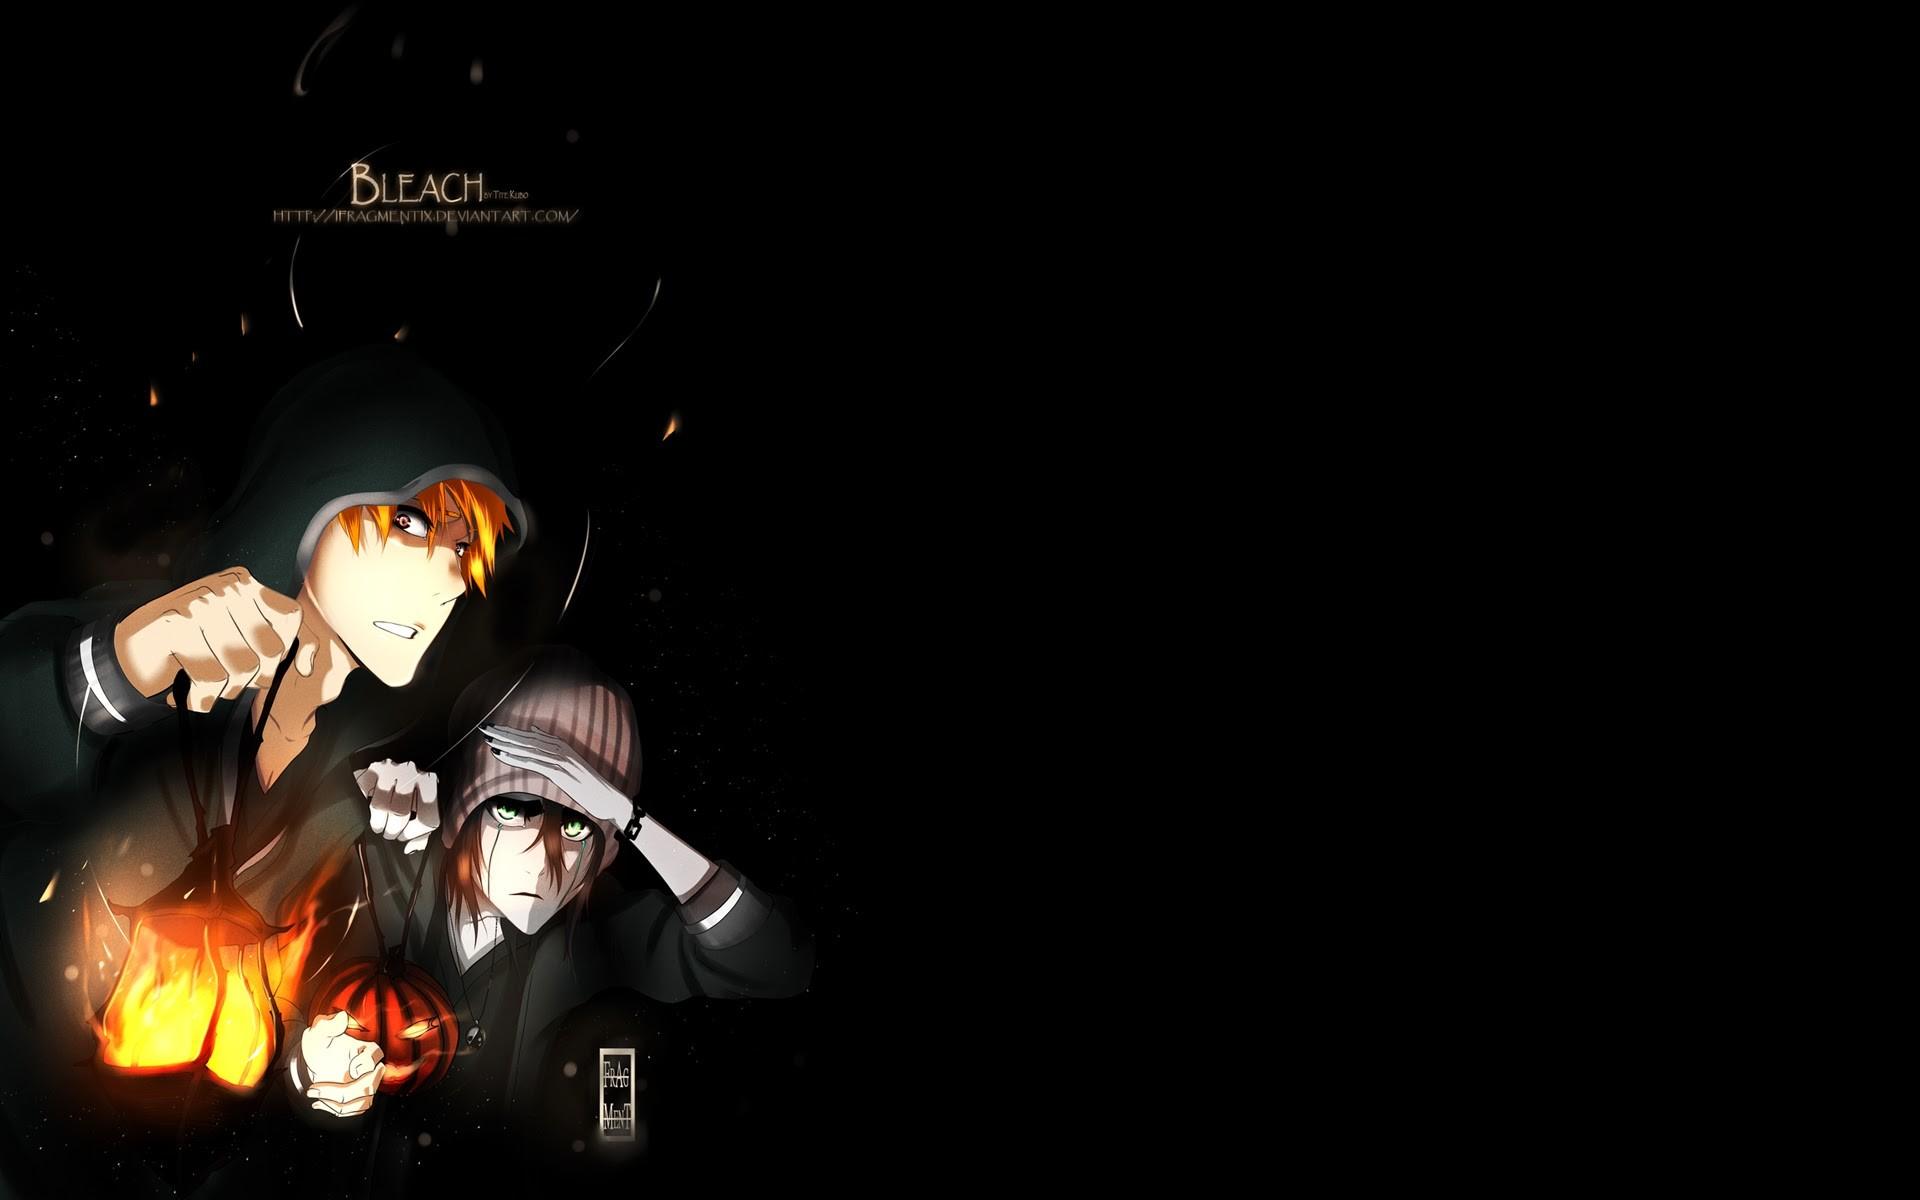 Ichigo and Ulquiorra Bleach Anime 4z Wallpaper HD. Ichigo And Ulquiorra  Bleach Anime 4z Wallpaper HD